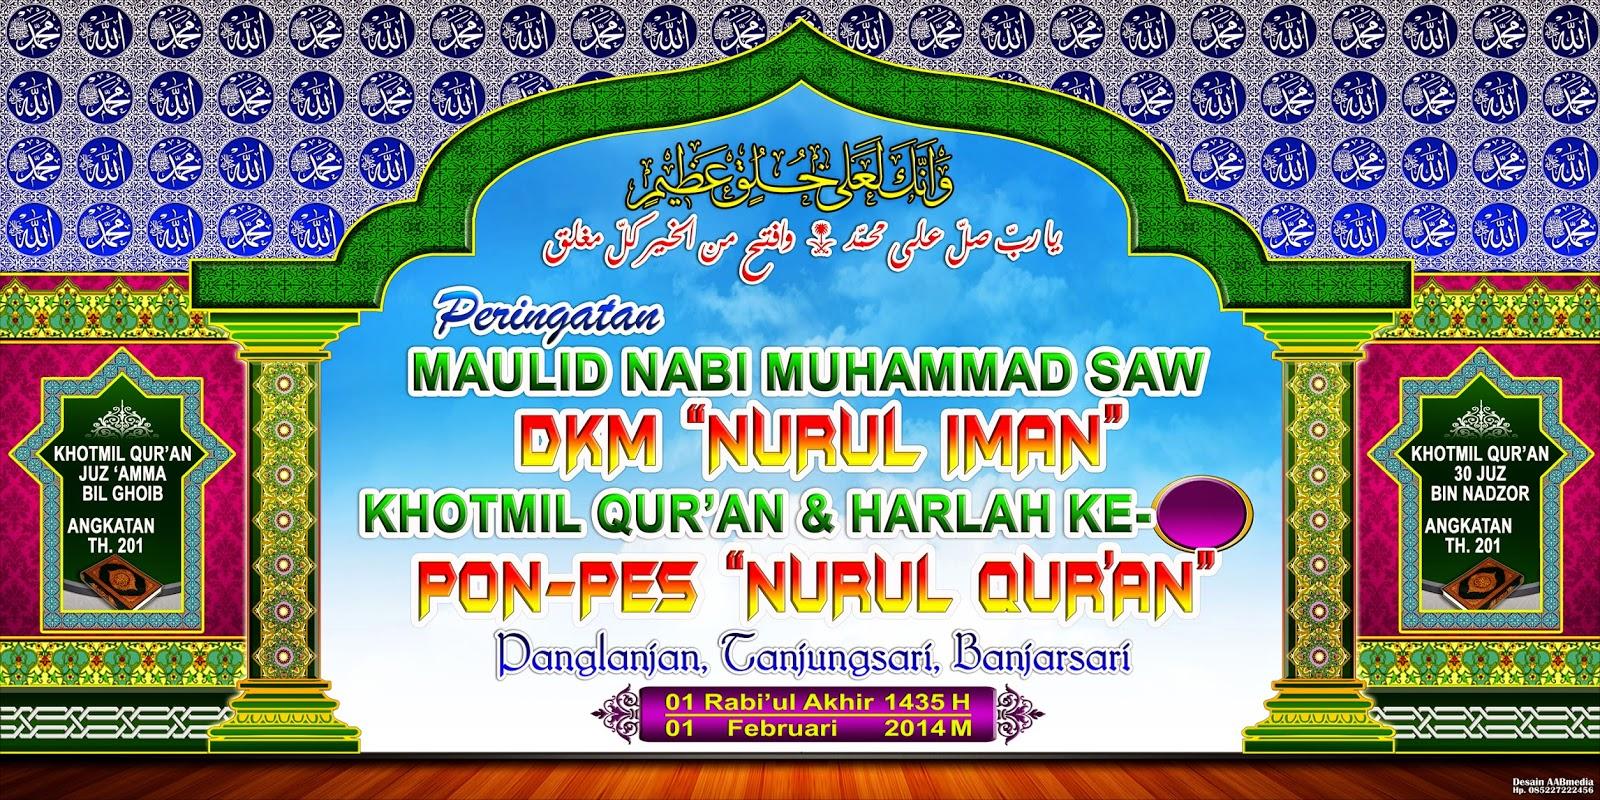 Banner Maulid Nabi SAW, Masjid Nurul Iman Panglanjan Banjarsari Ciamis ...